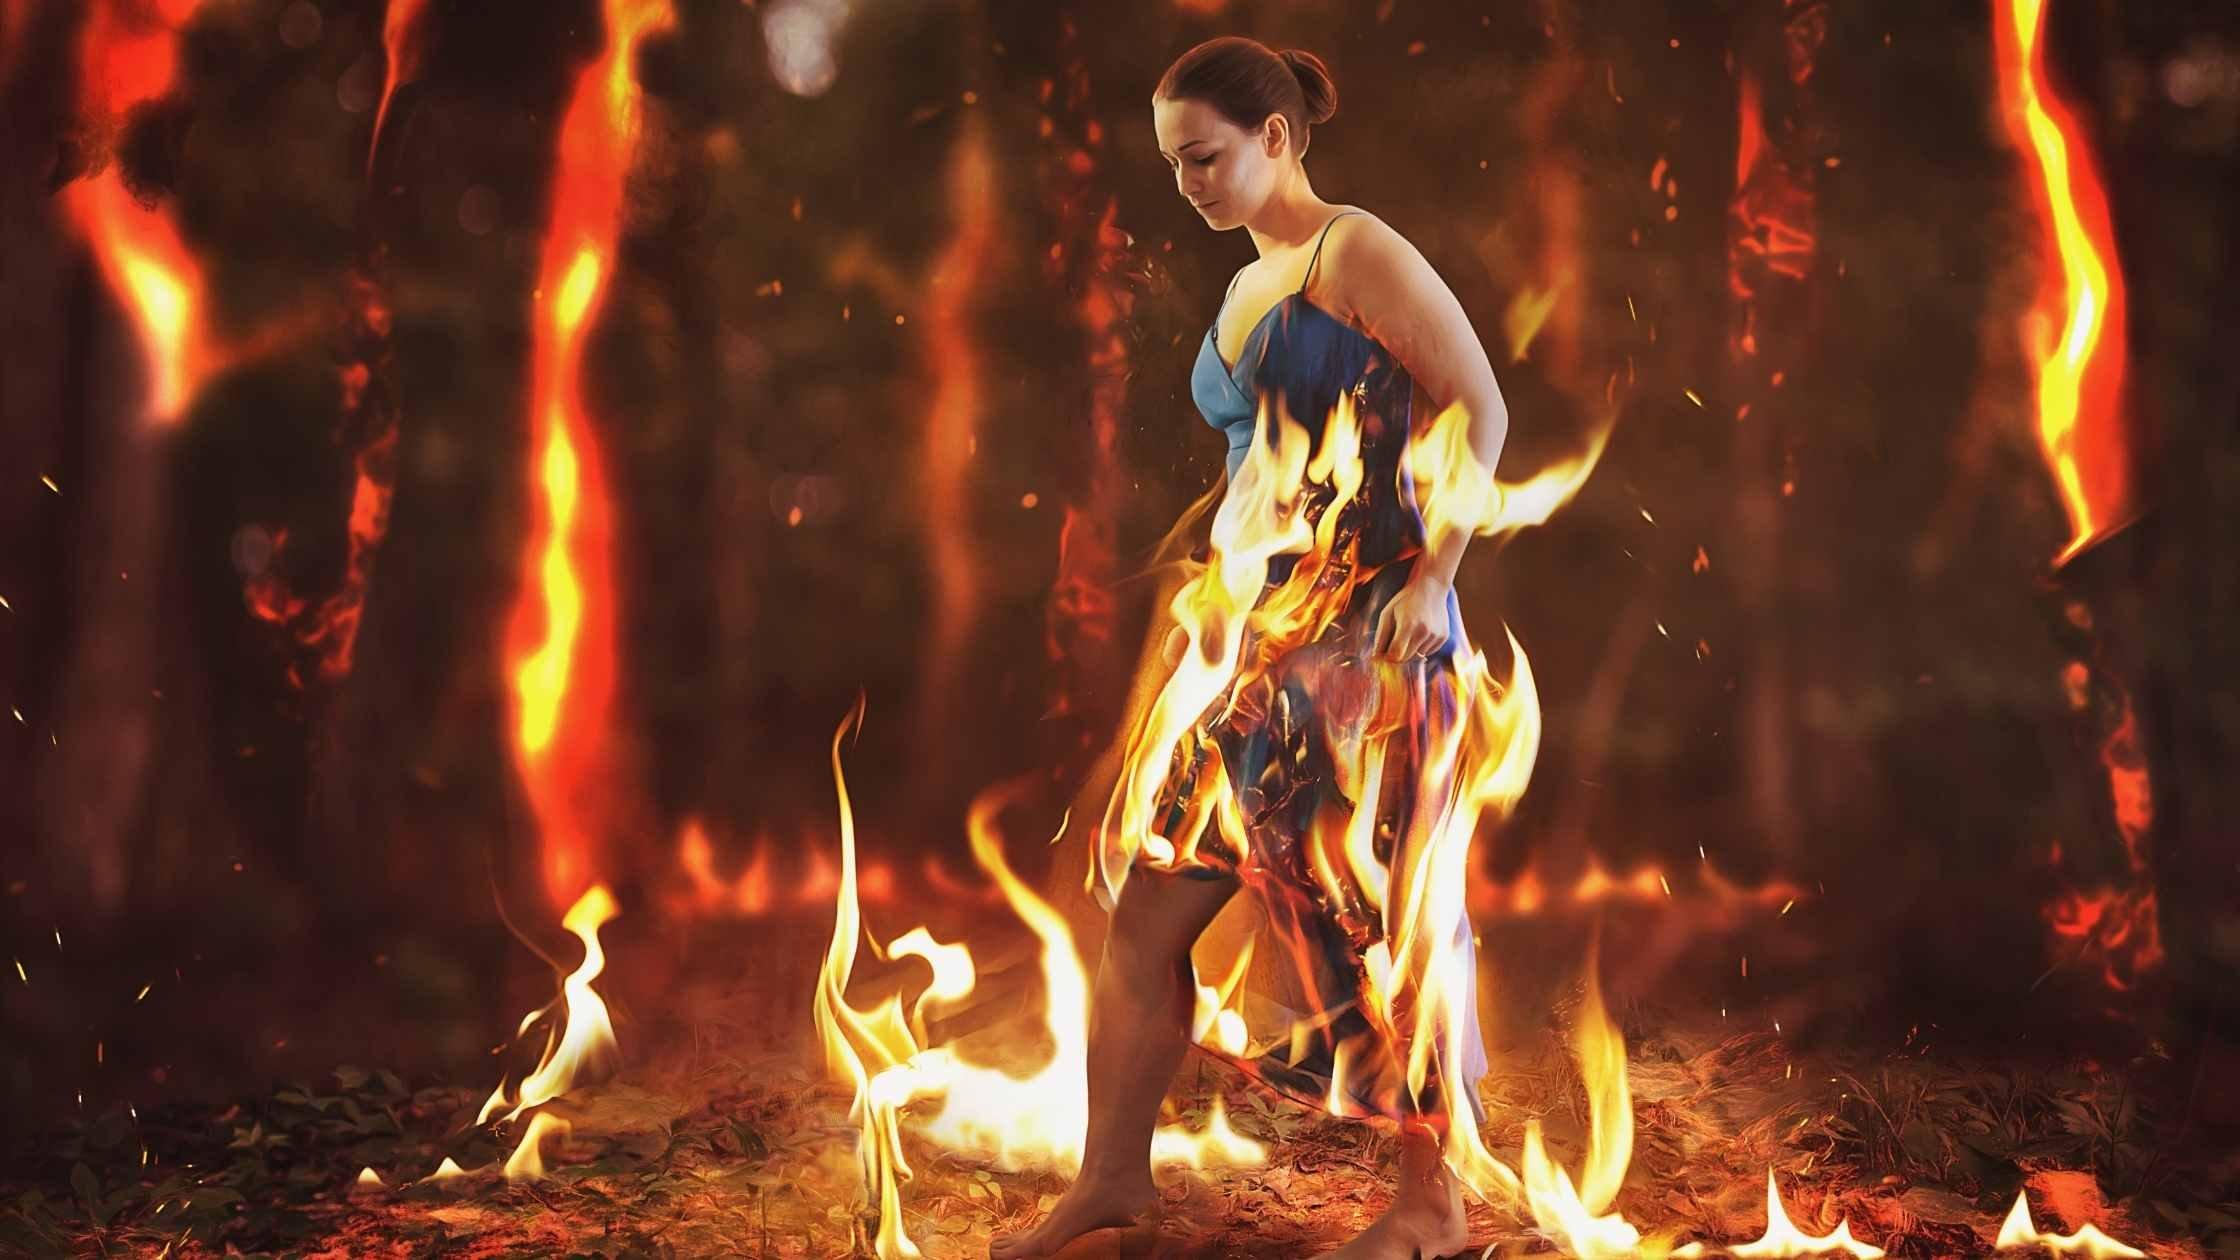 Woman walks through a burning forest fire